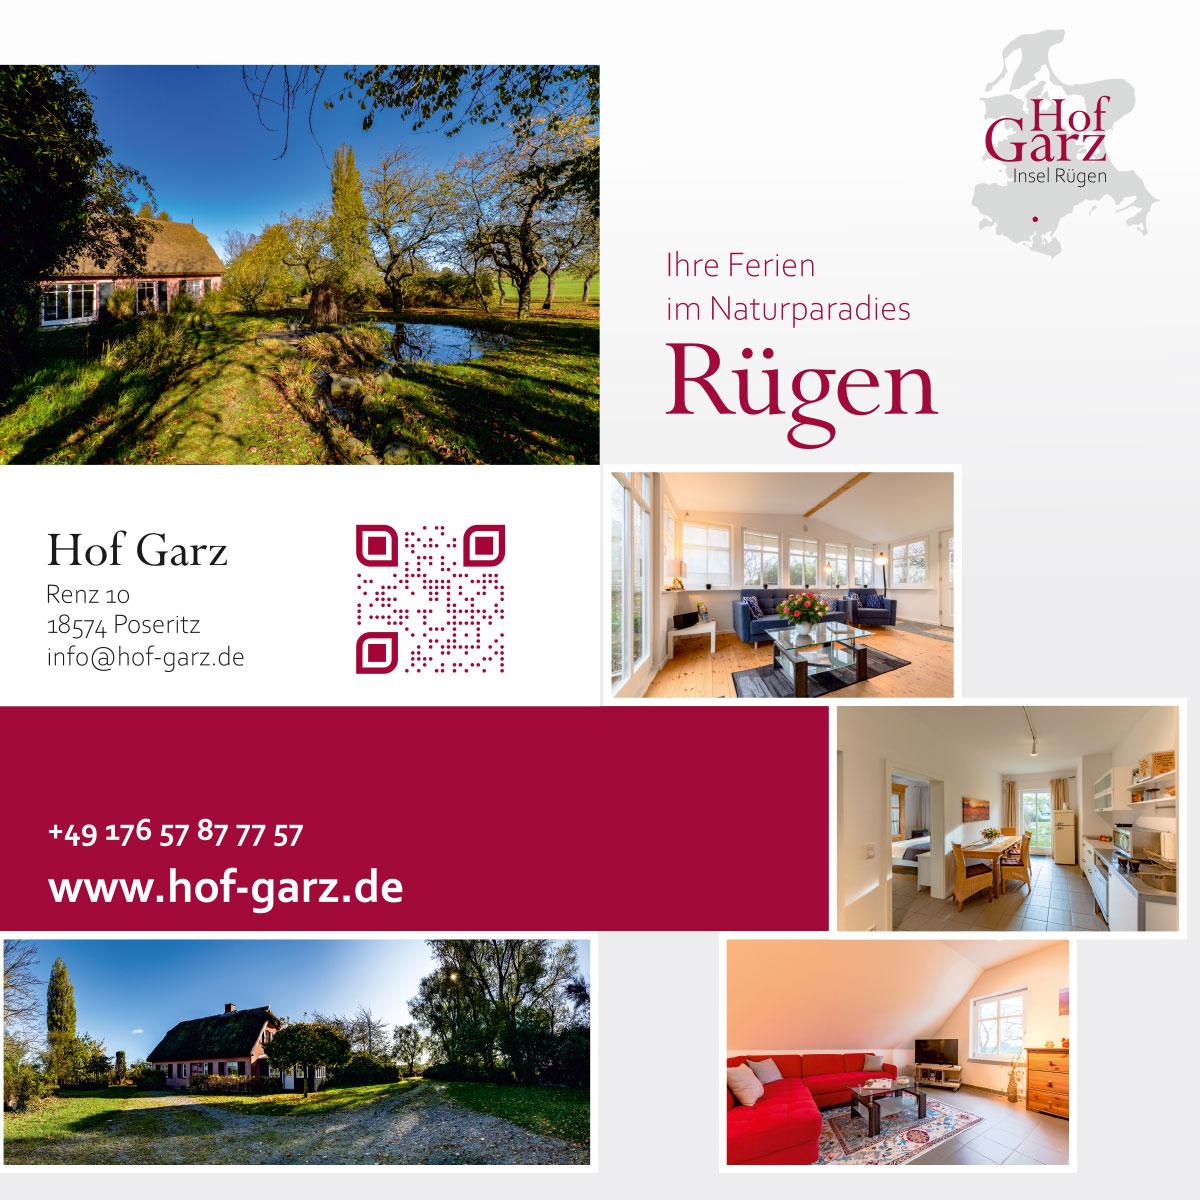 Flyer, Postkarten, Visitenkarten, Logo Grafikdesign Referenz - Hof Garz Rügen